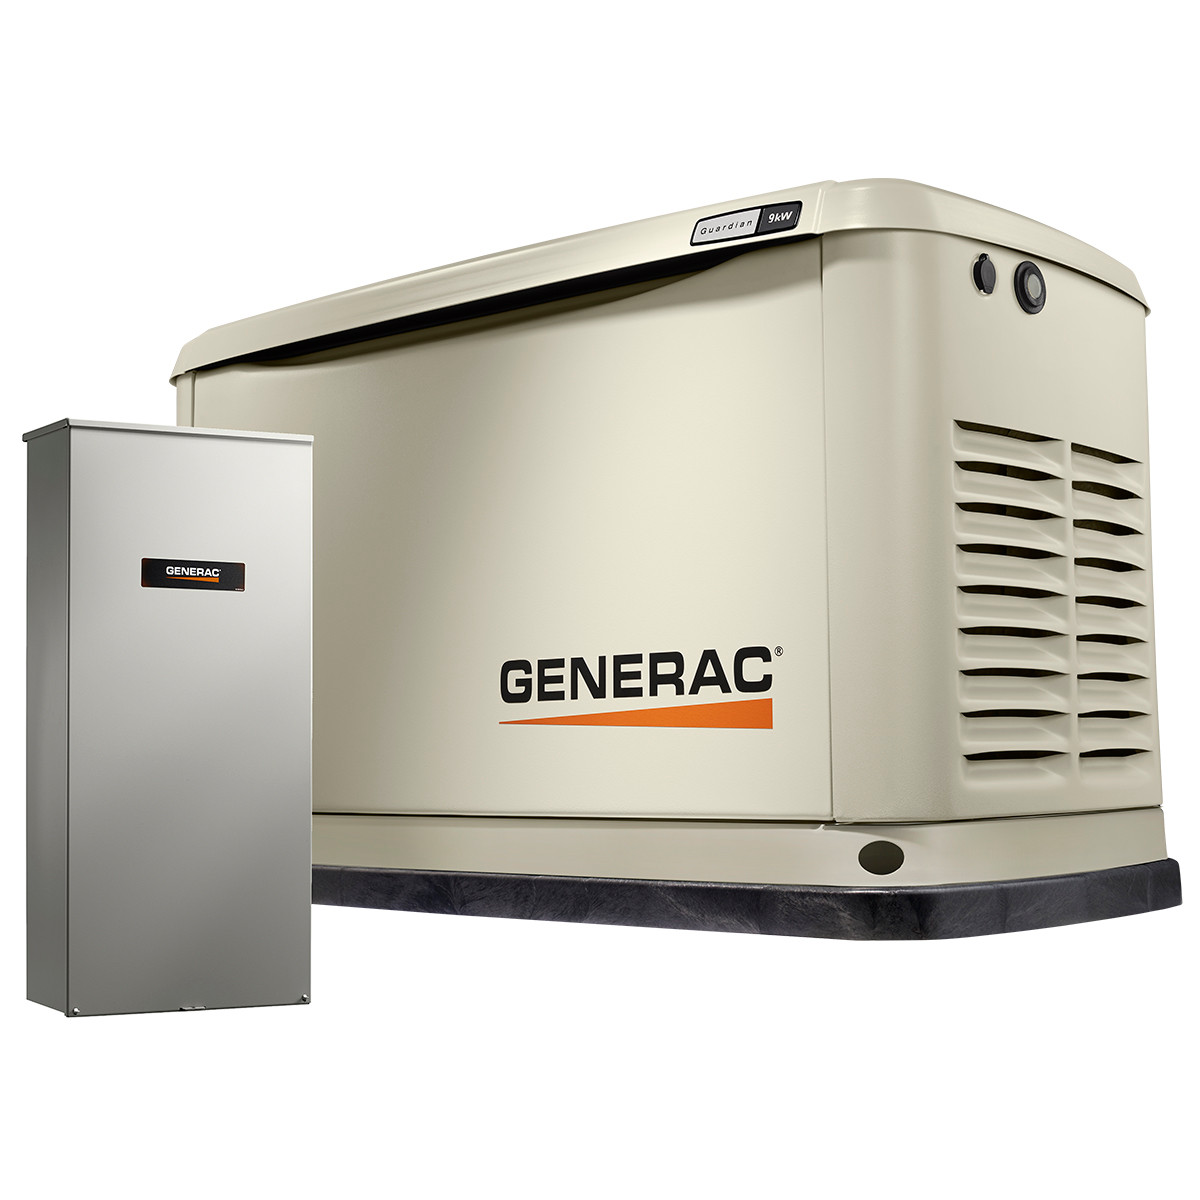 generac guardian 7030 9kw generator with wi fi 100a 16 circuit transfer switch [ 1200 x 1200 Pixel ]